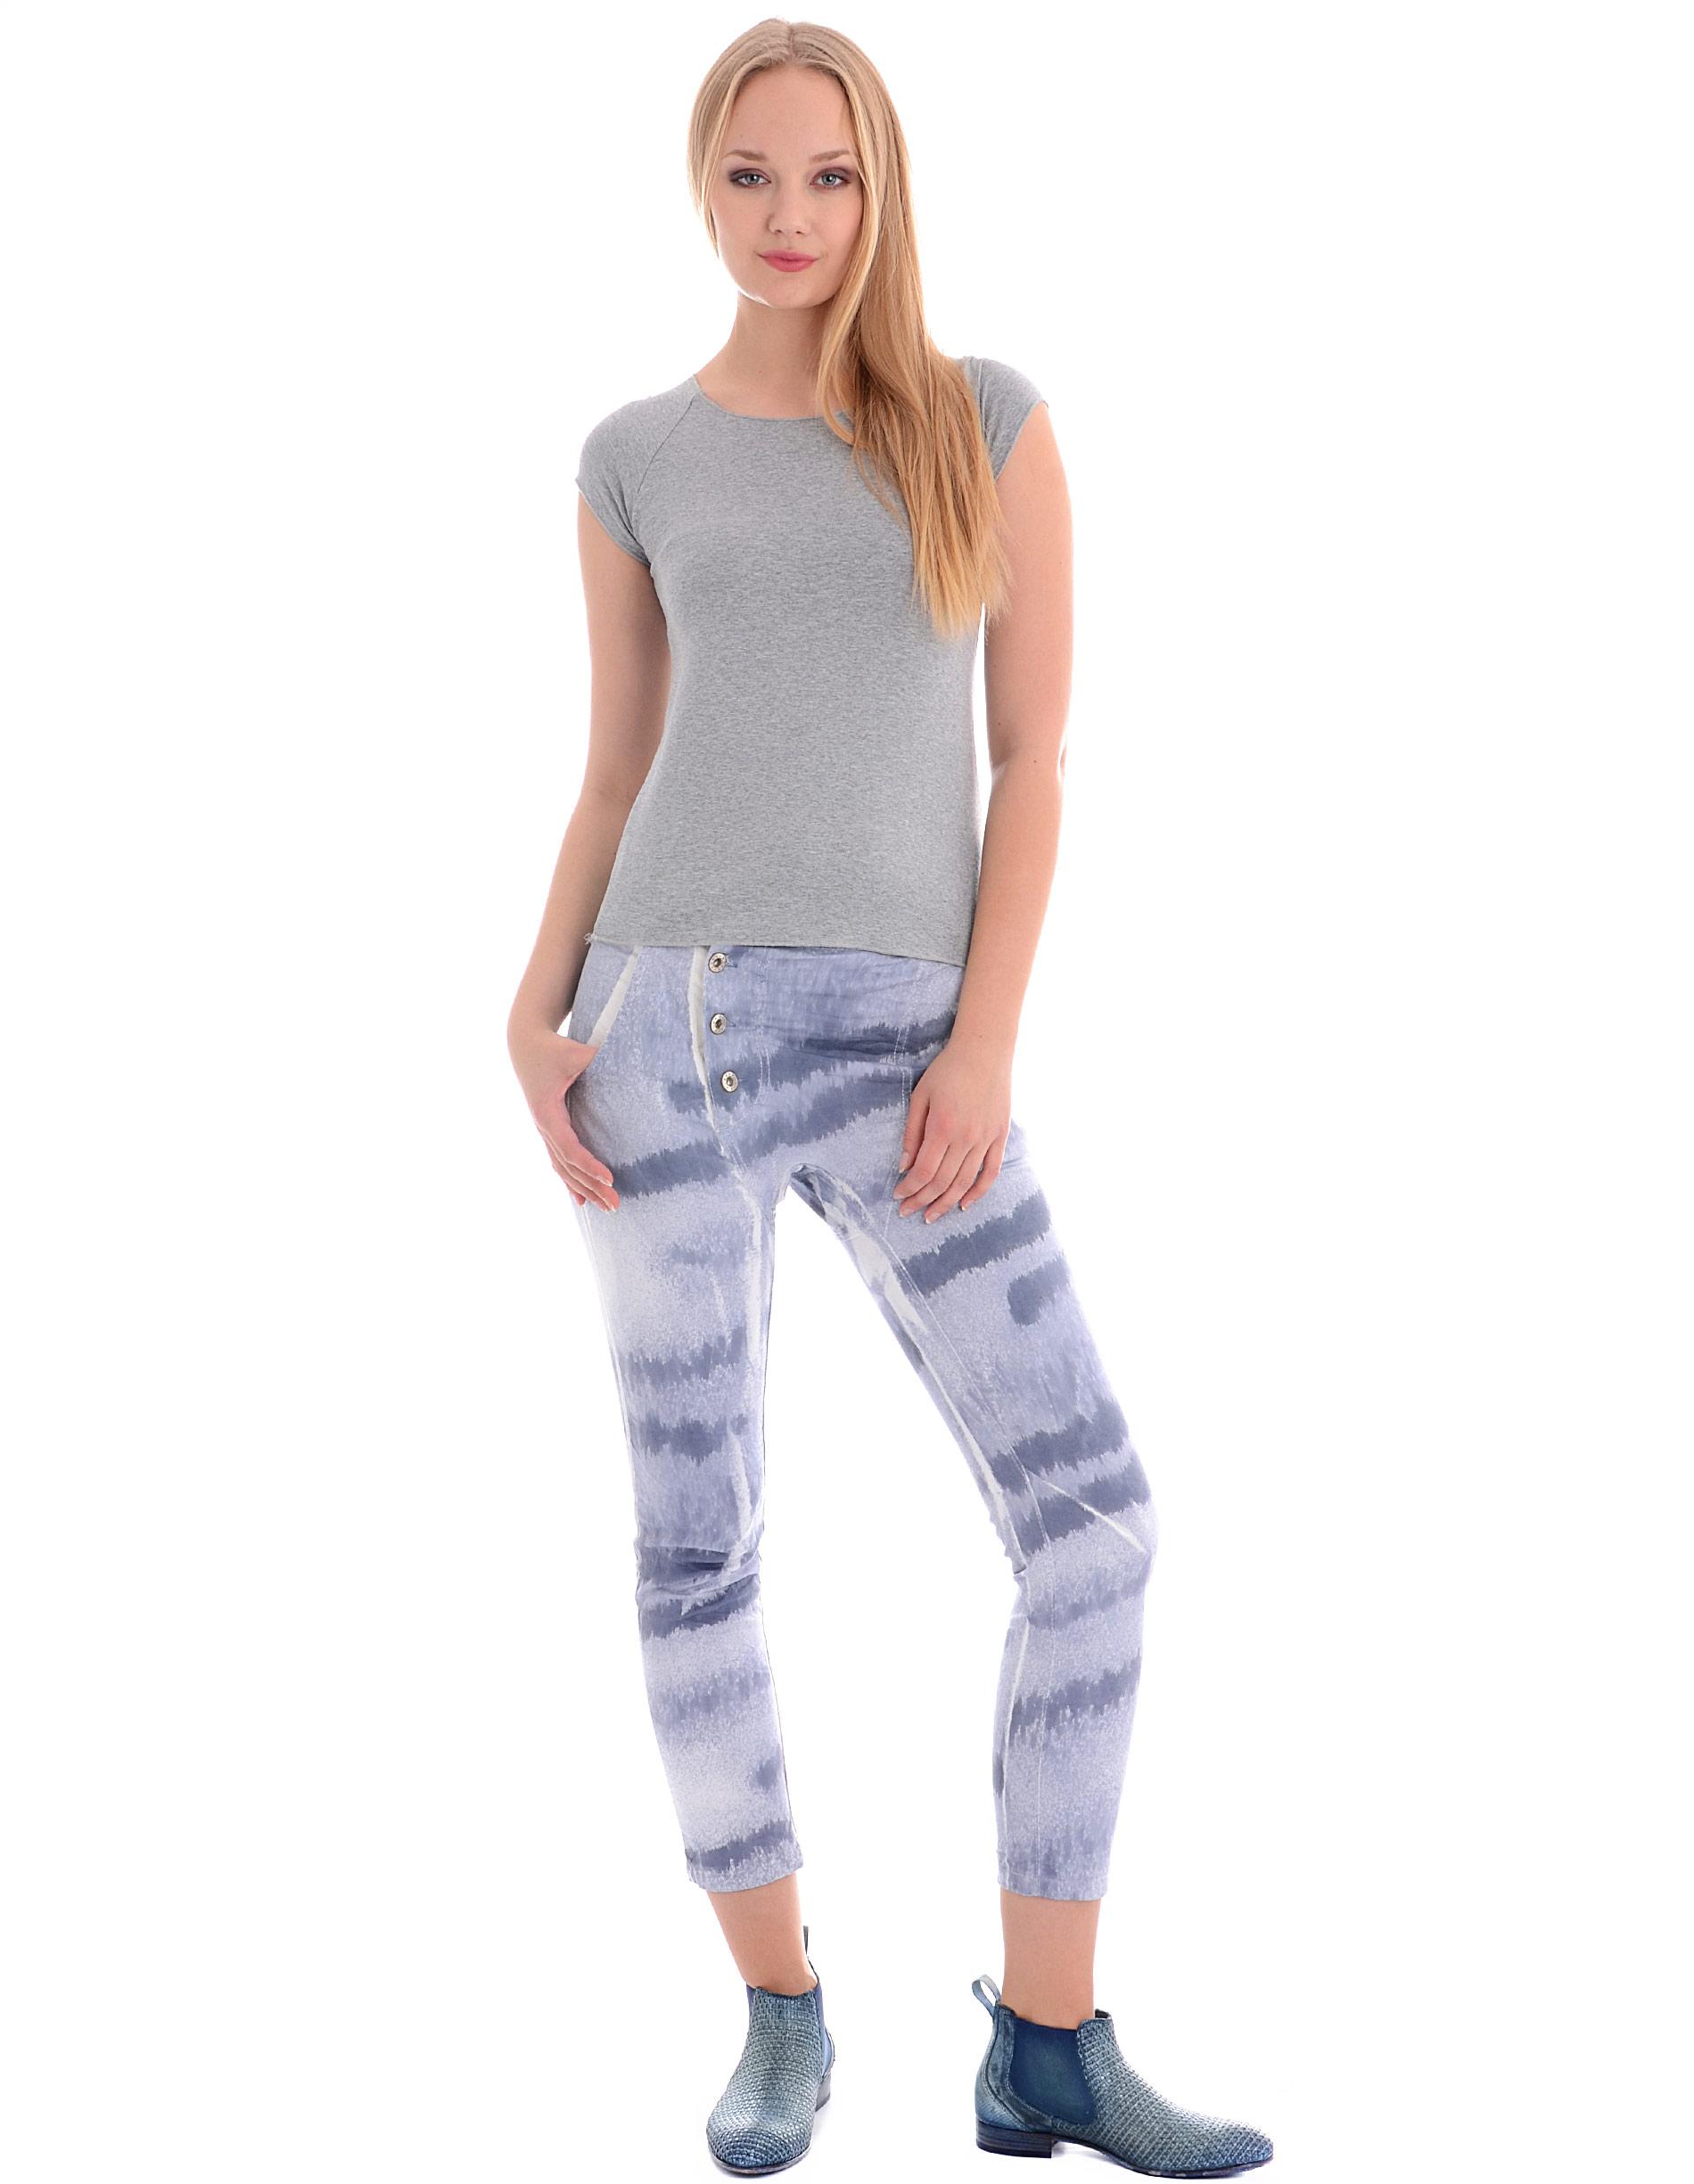 Spodnie - 104-1119B JEA - Unisono